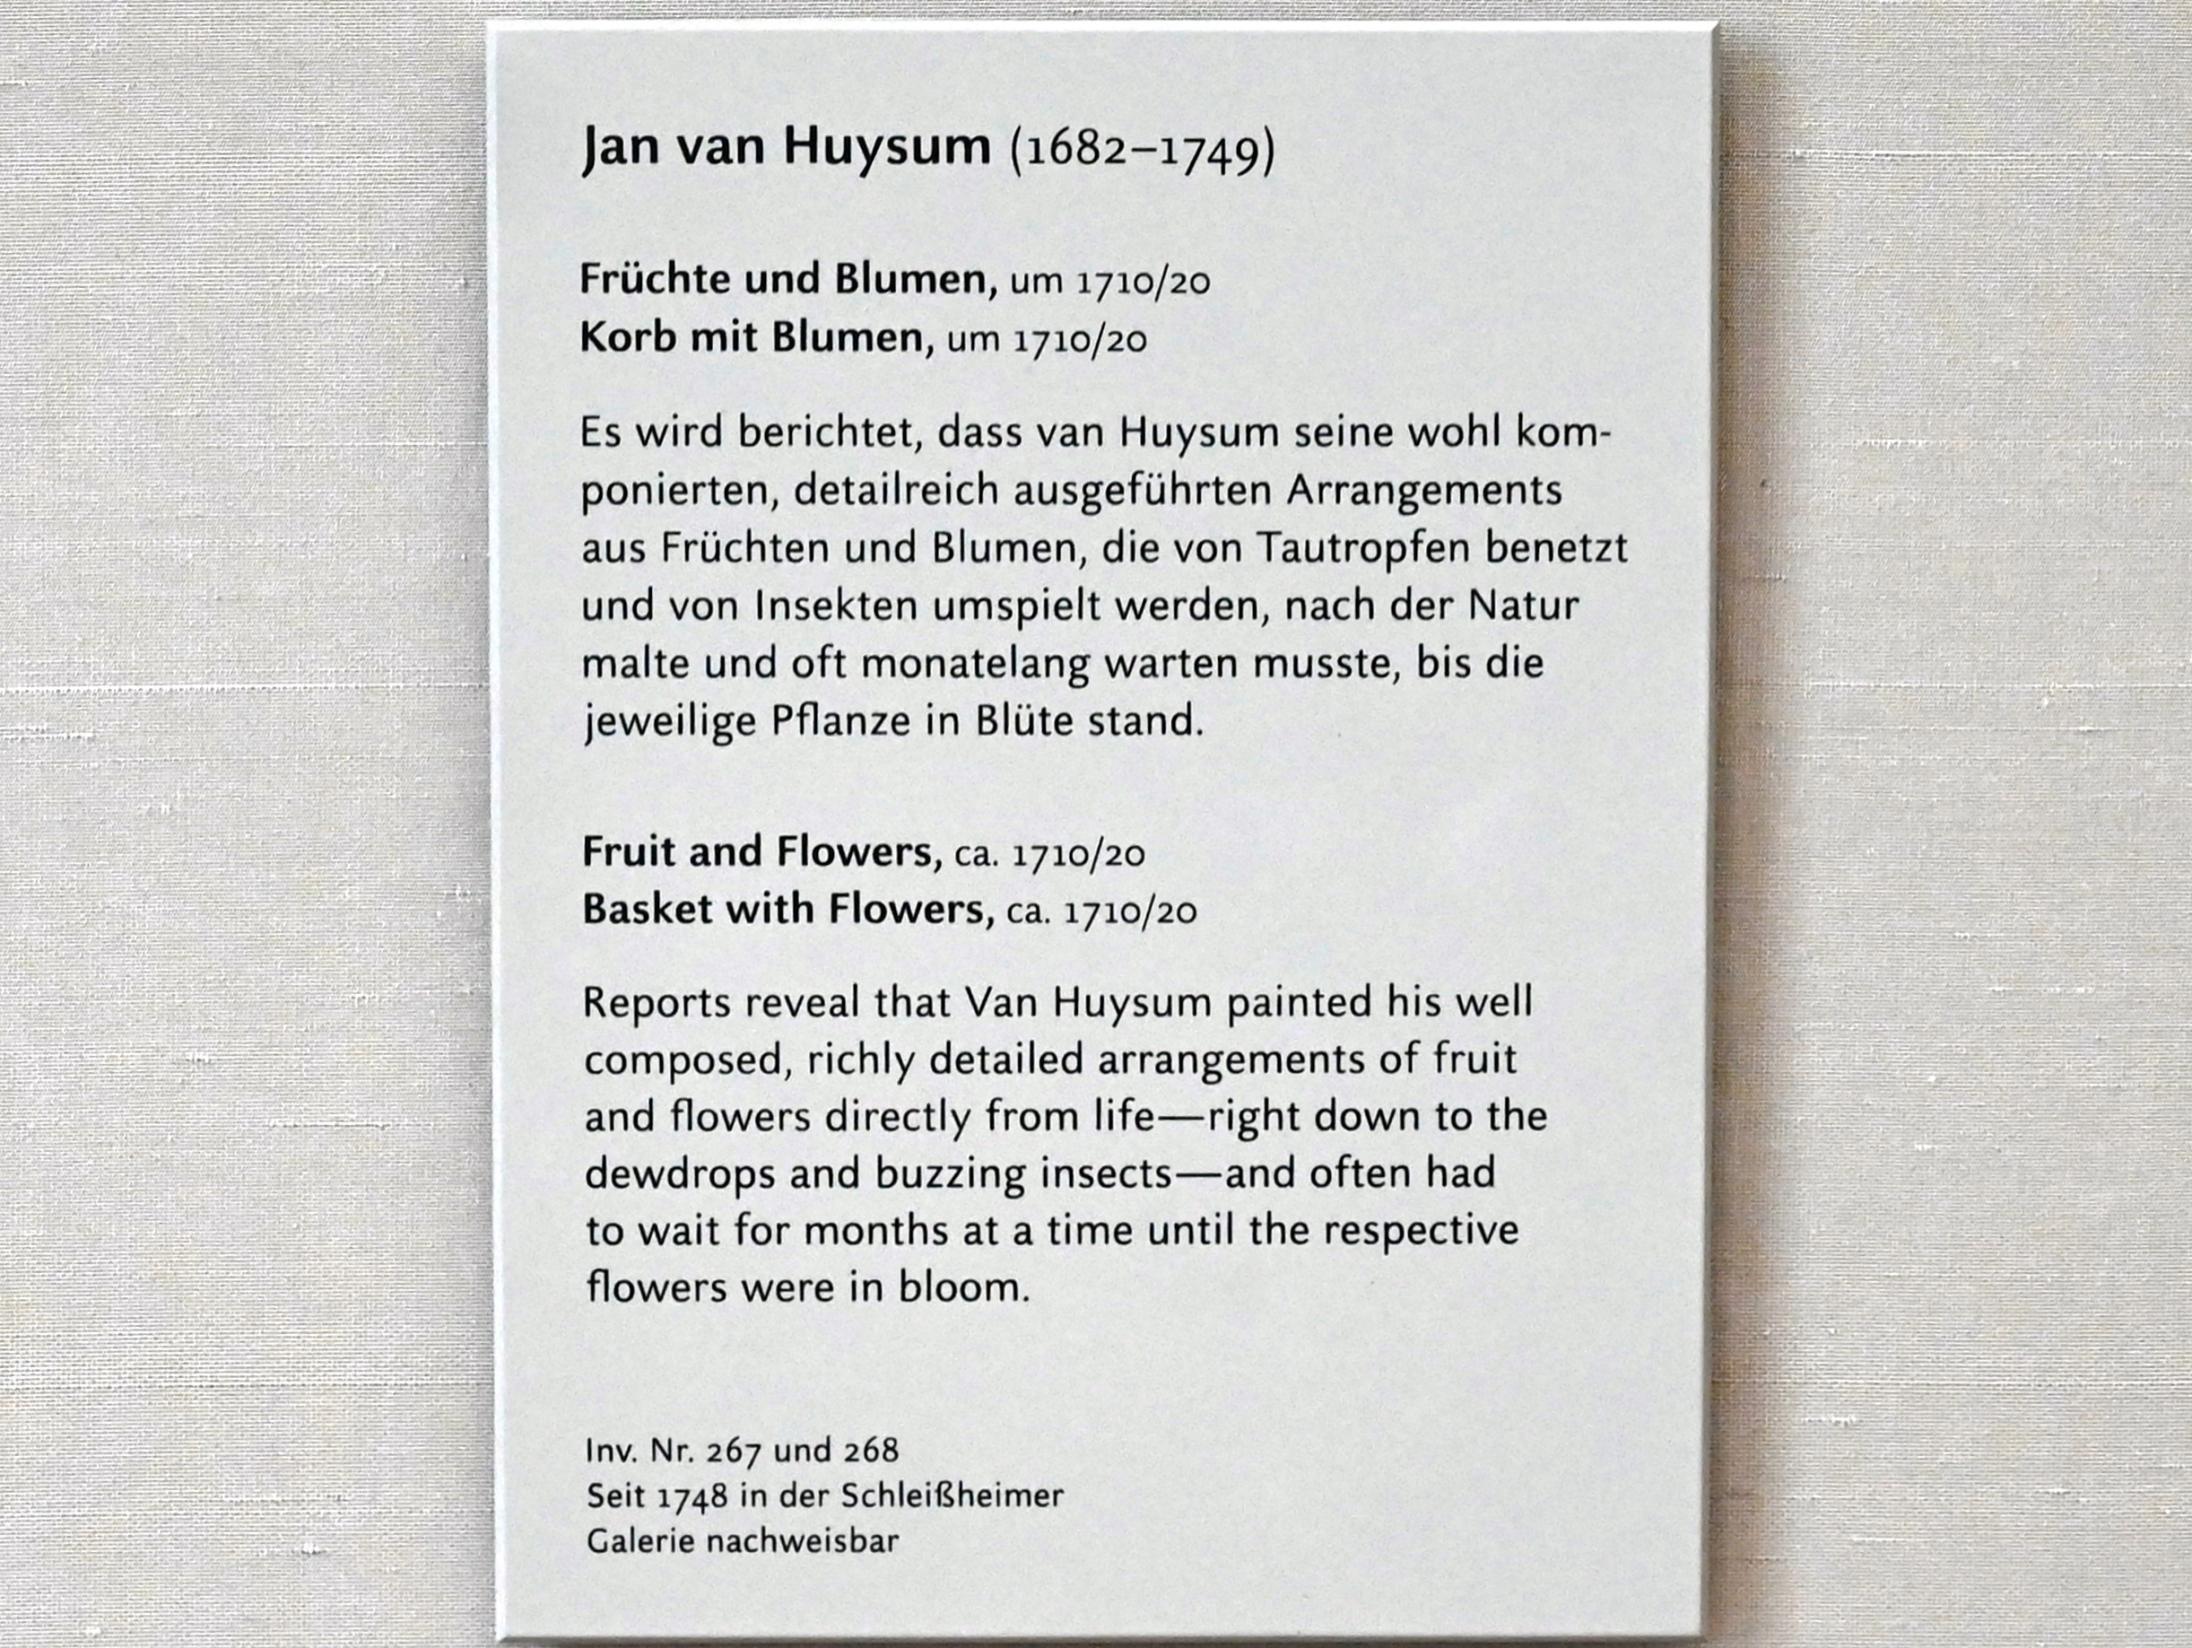 Jan van Huysum: Korb mit Blumen, Um 1710 - 1720